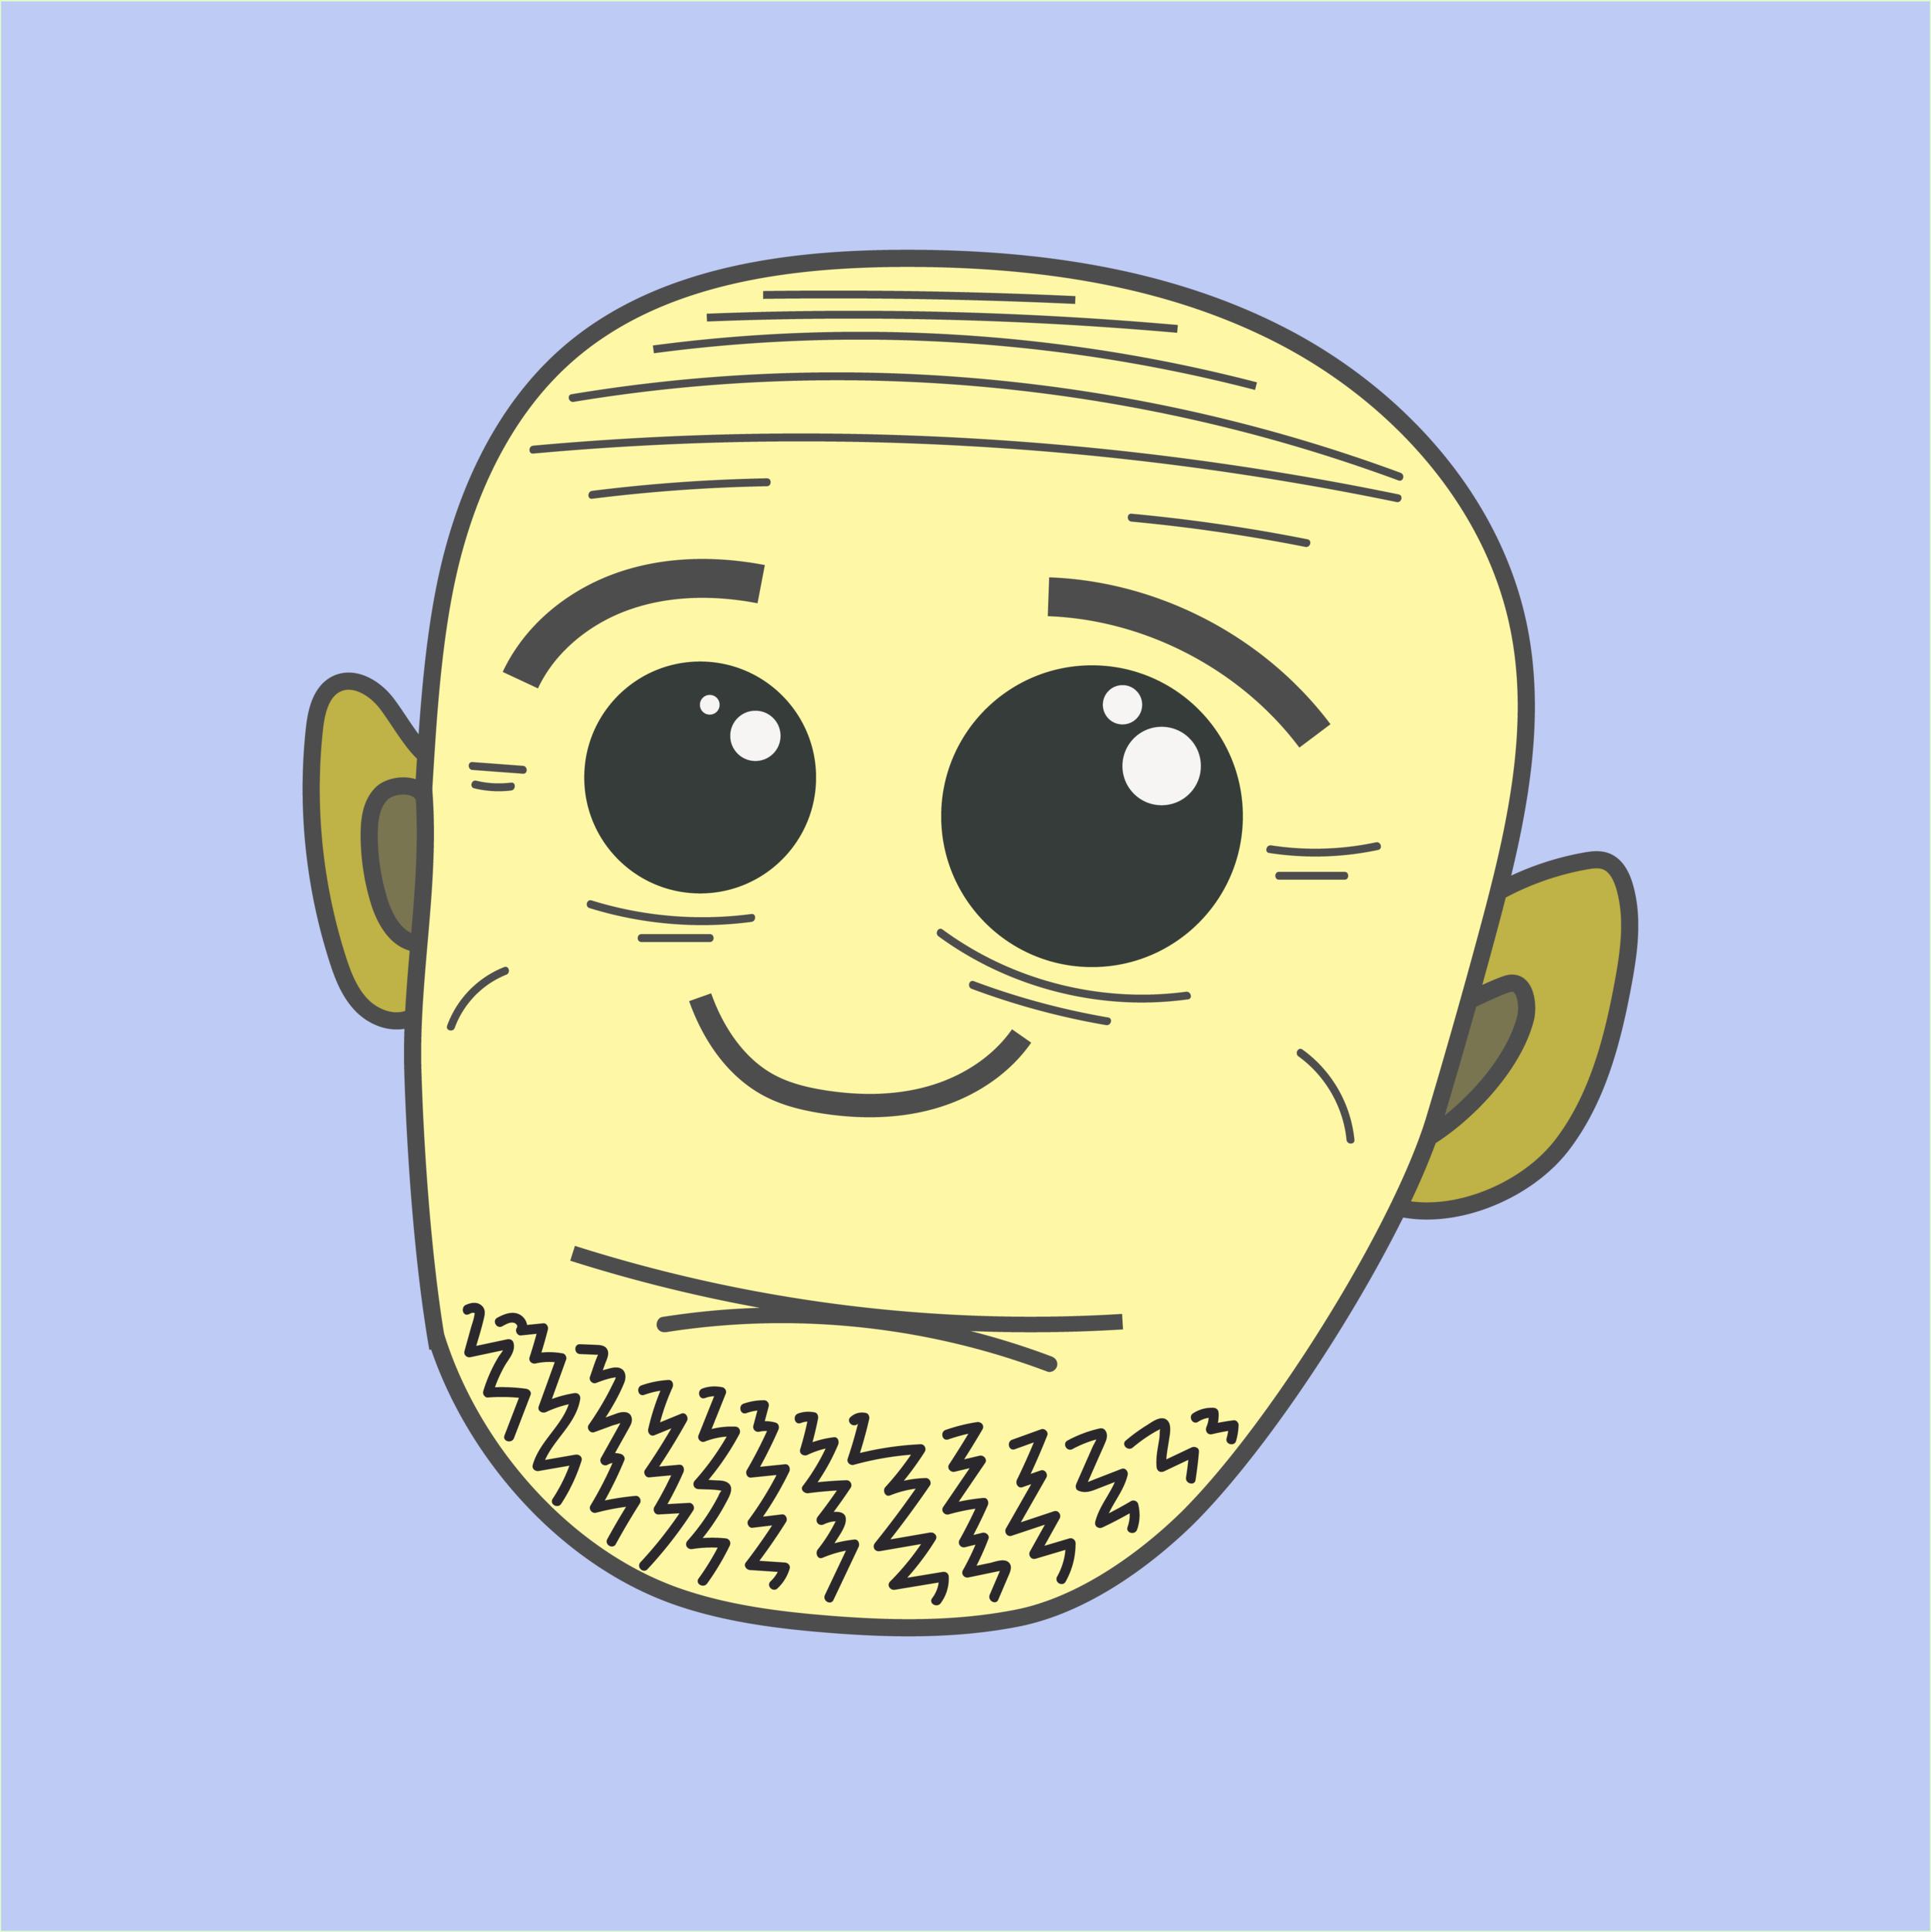 Worried Wesley  2018 Digital illustration 8000 px x 8000 px